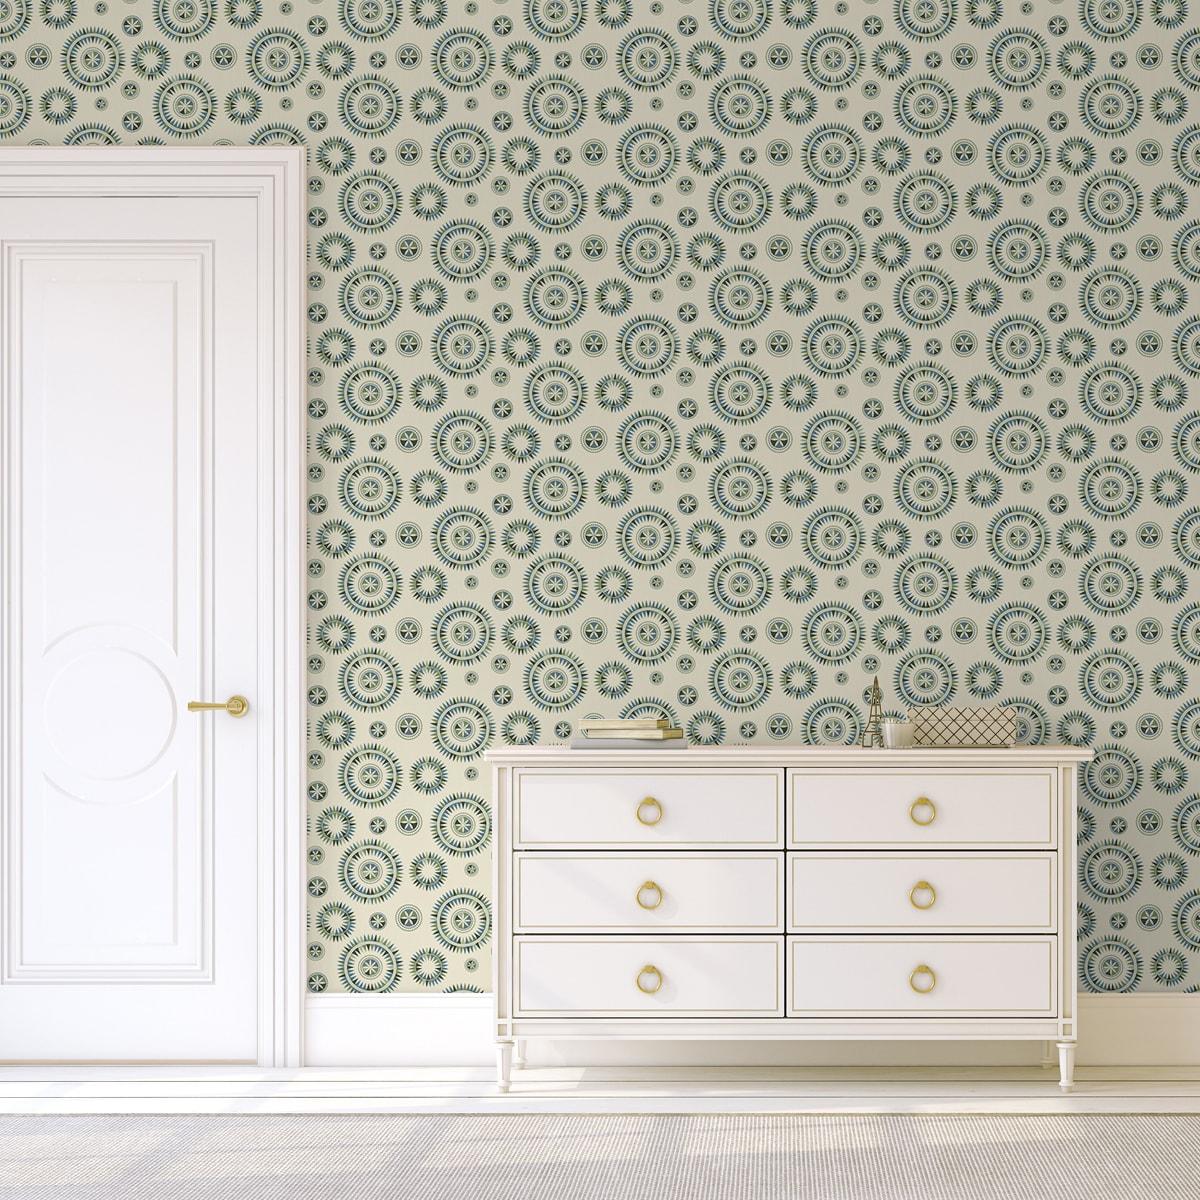 tapete windrose mit skandinavisches design gmm. Black Bedroom Furniture Sets. Home Design Ideas